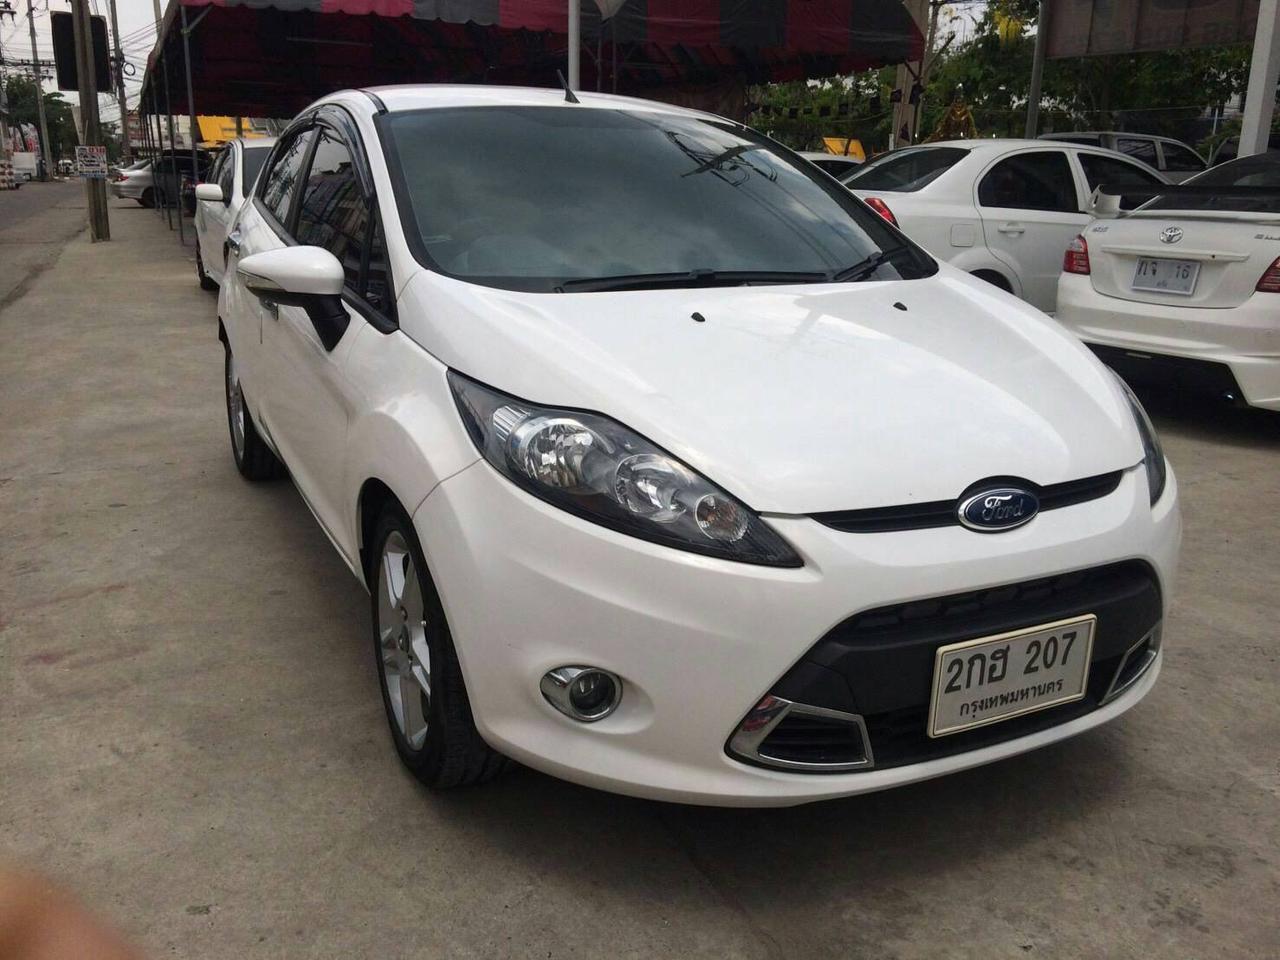 Ford Fiesta รูปที่ 2